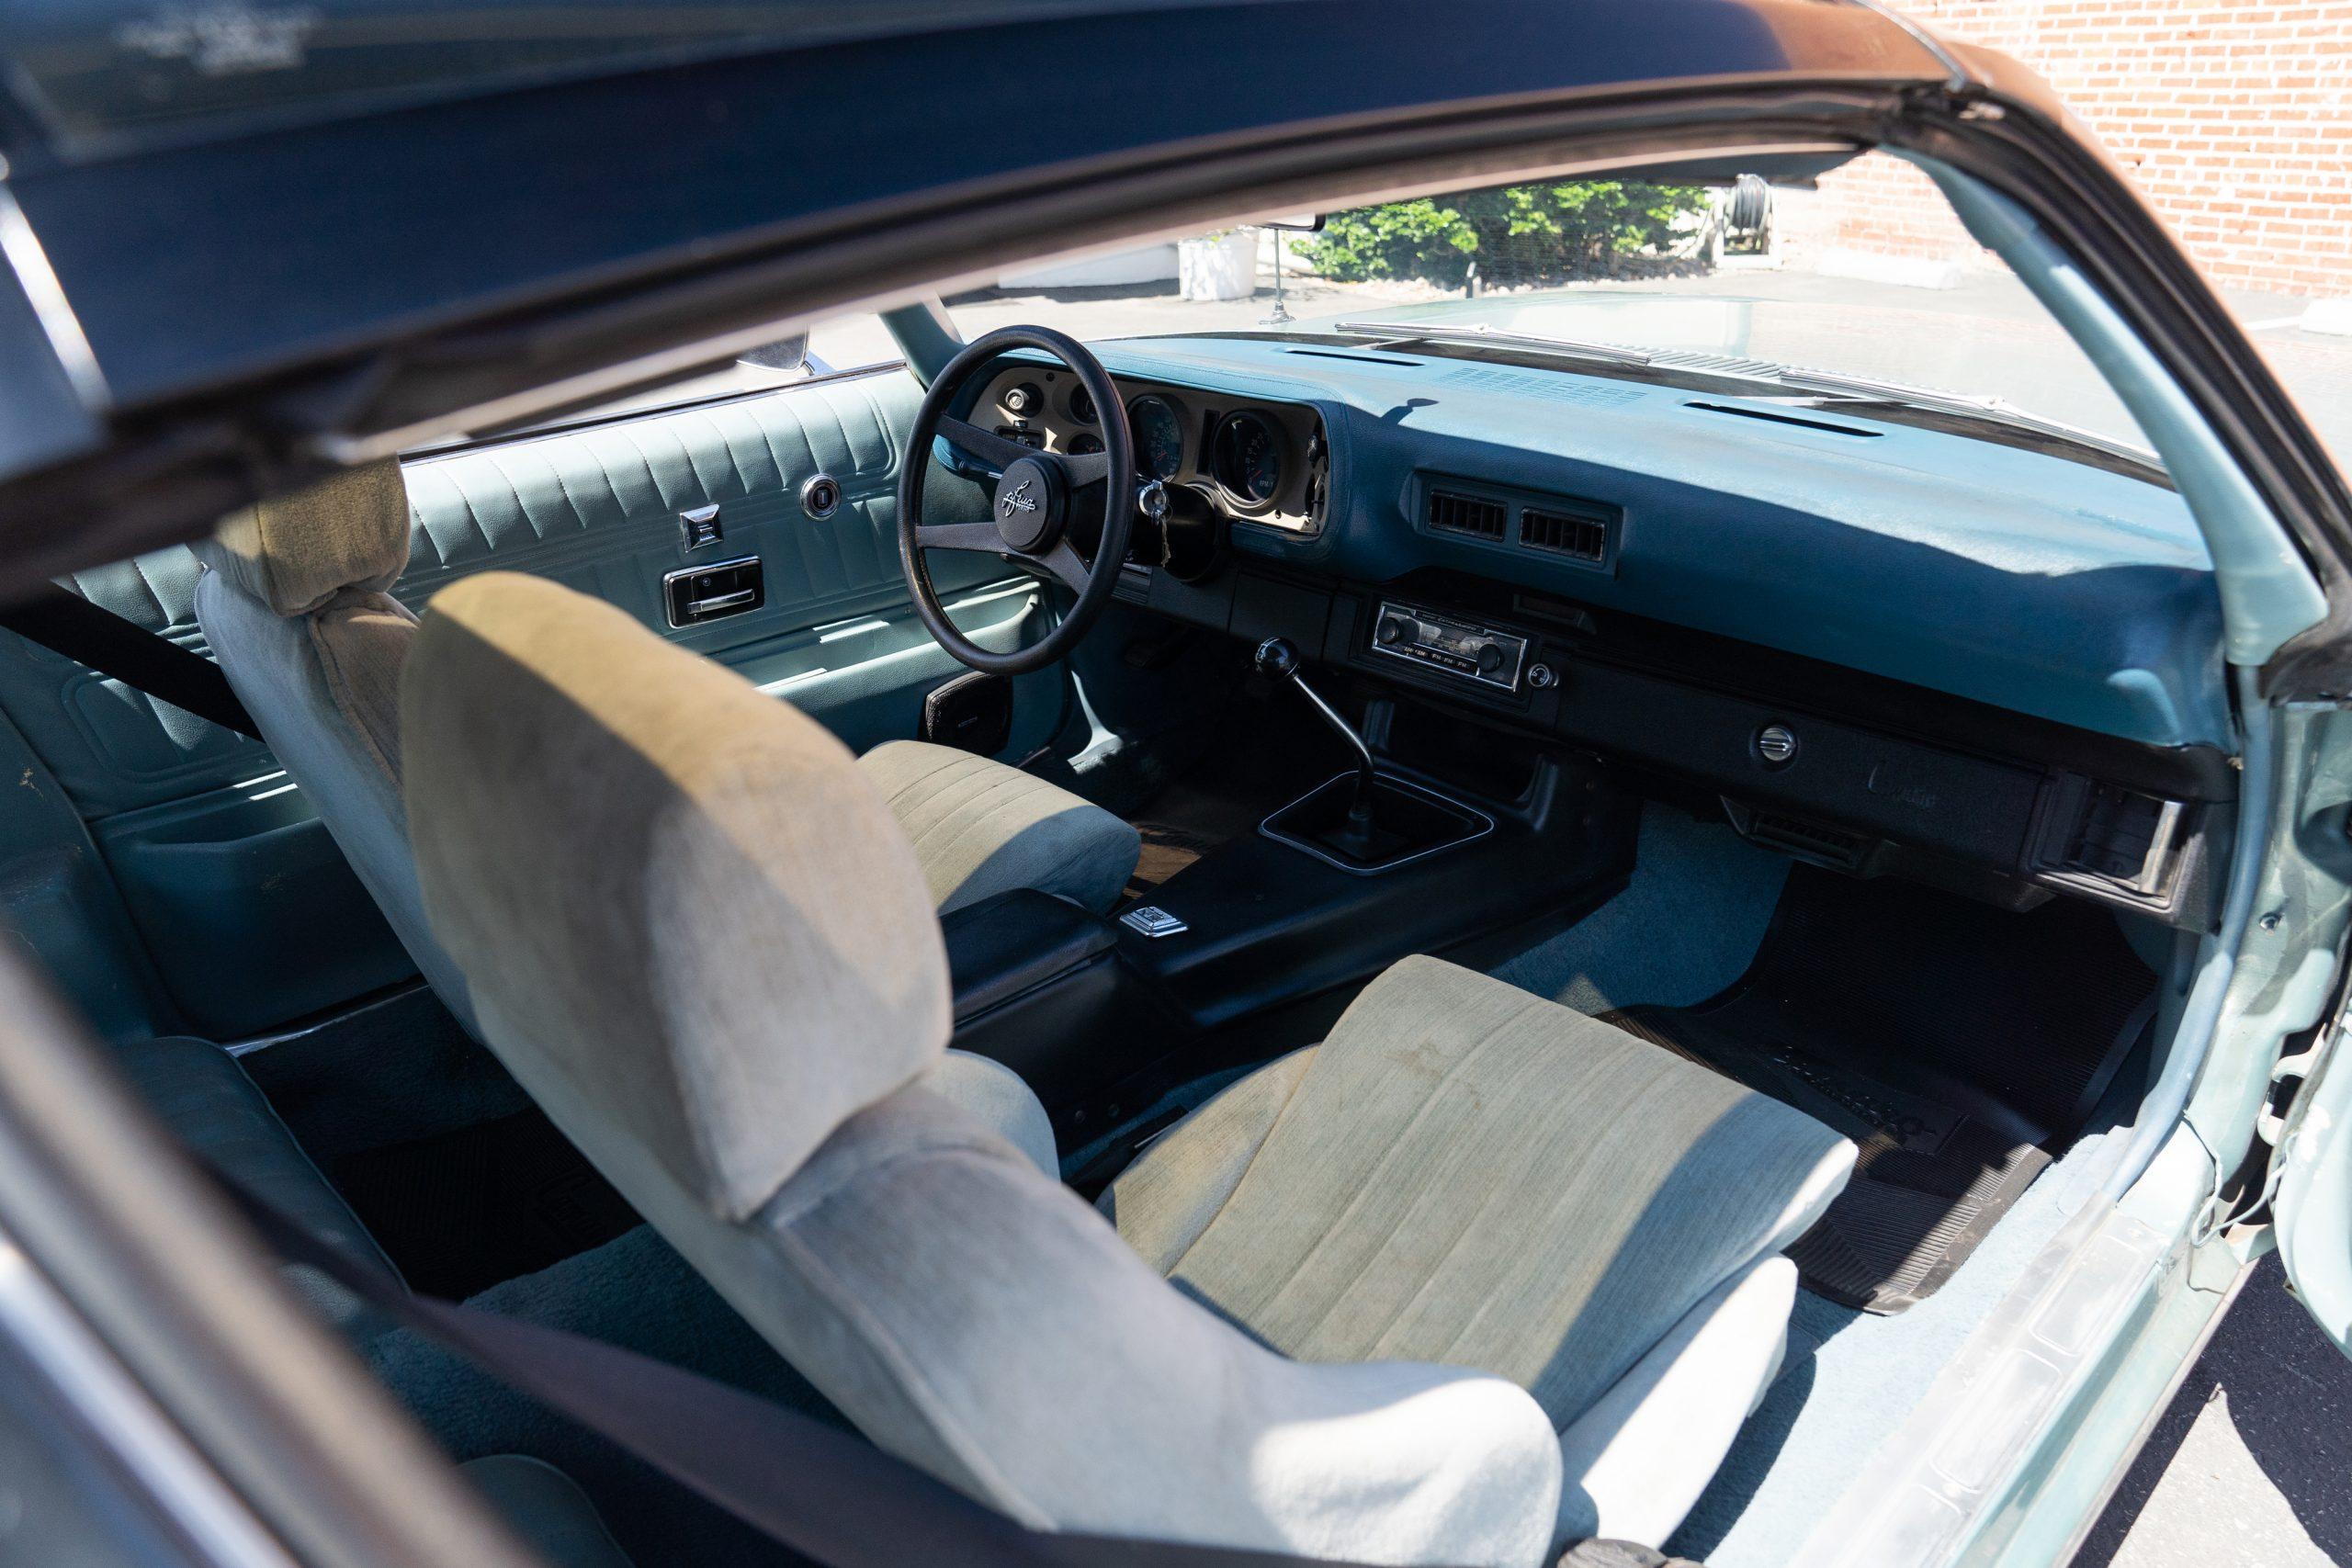 Europo Hurst front interior angled